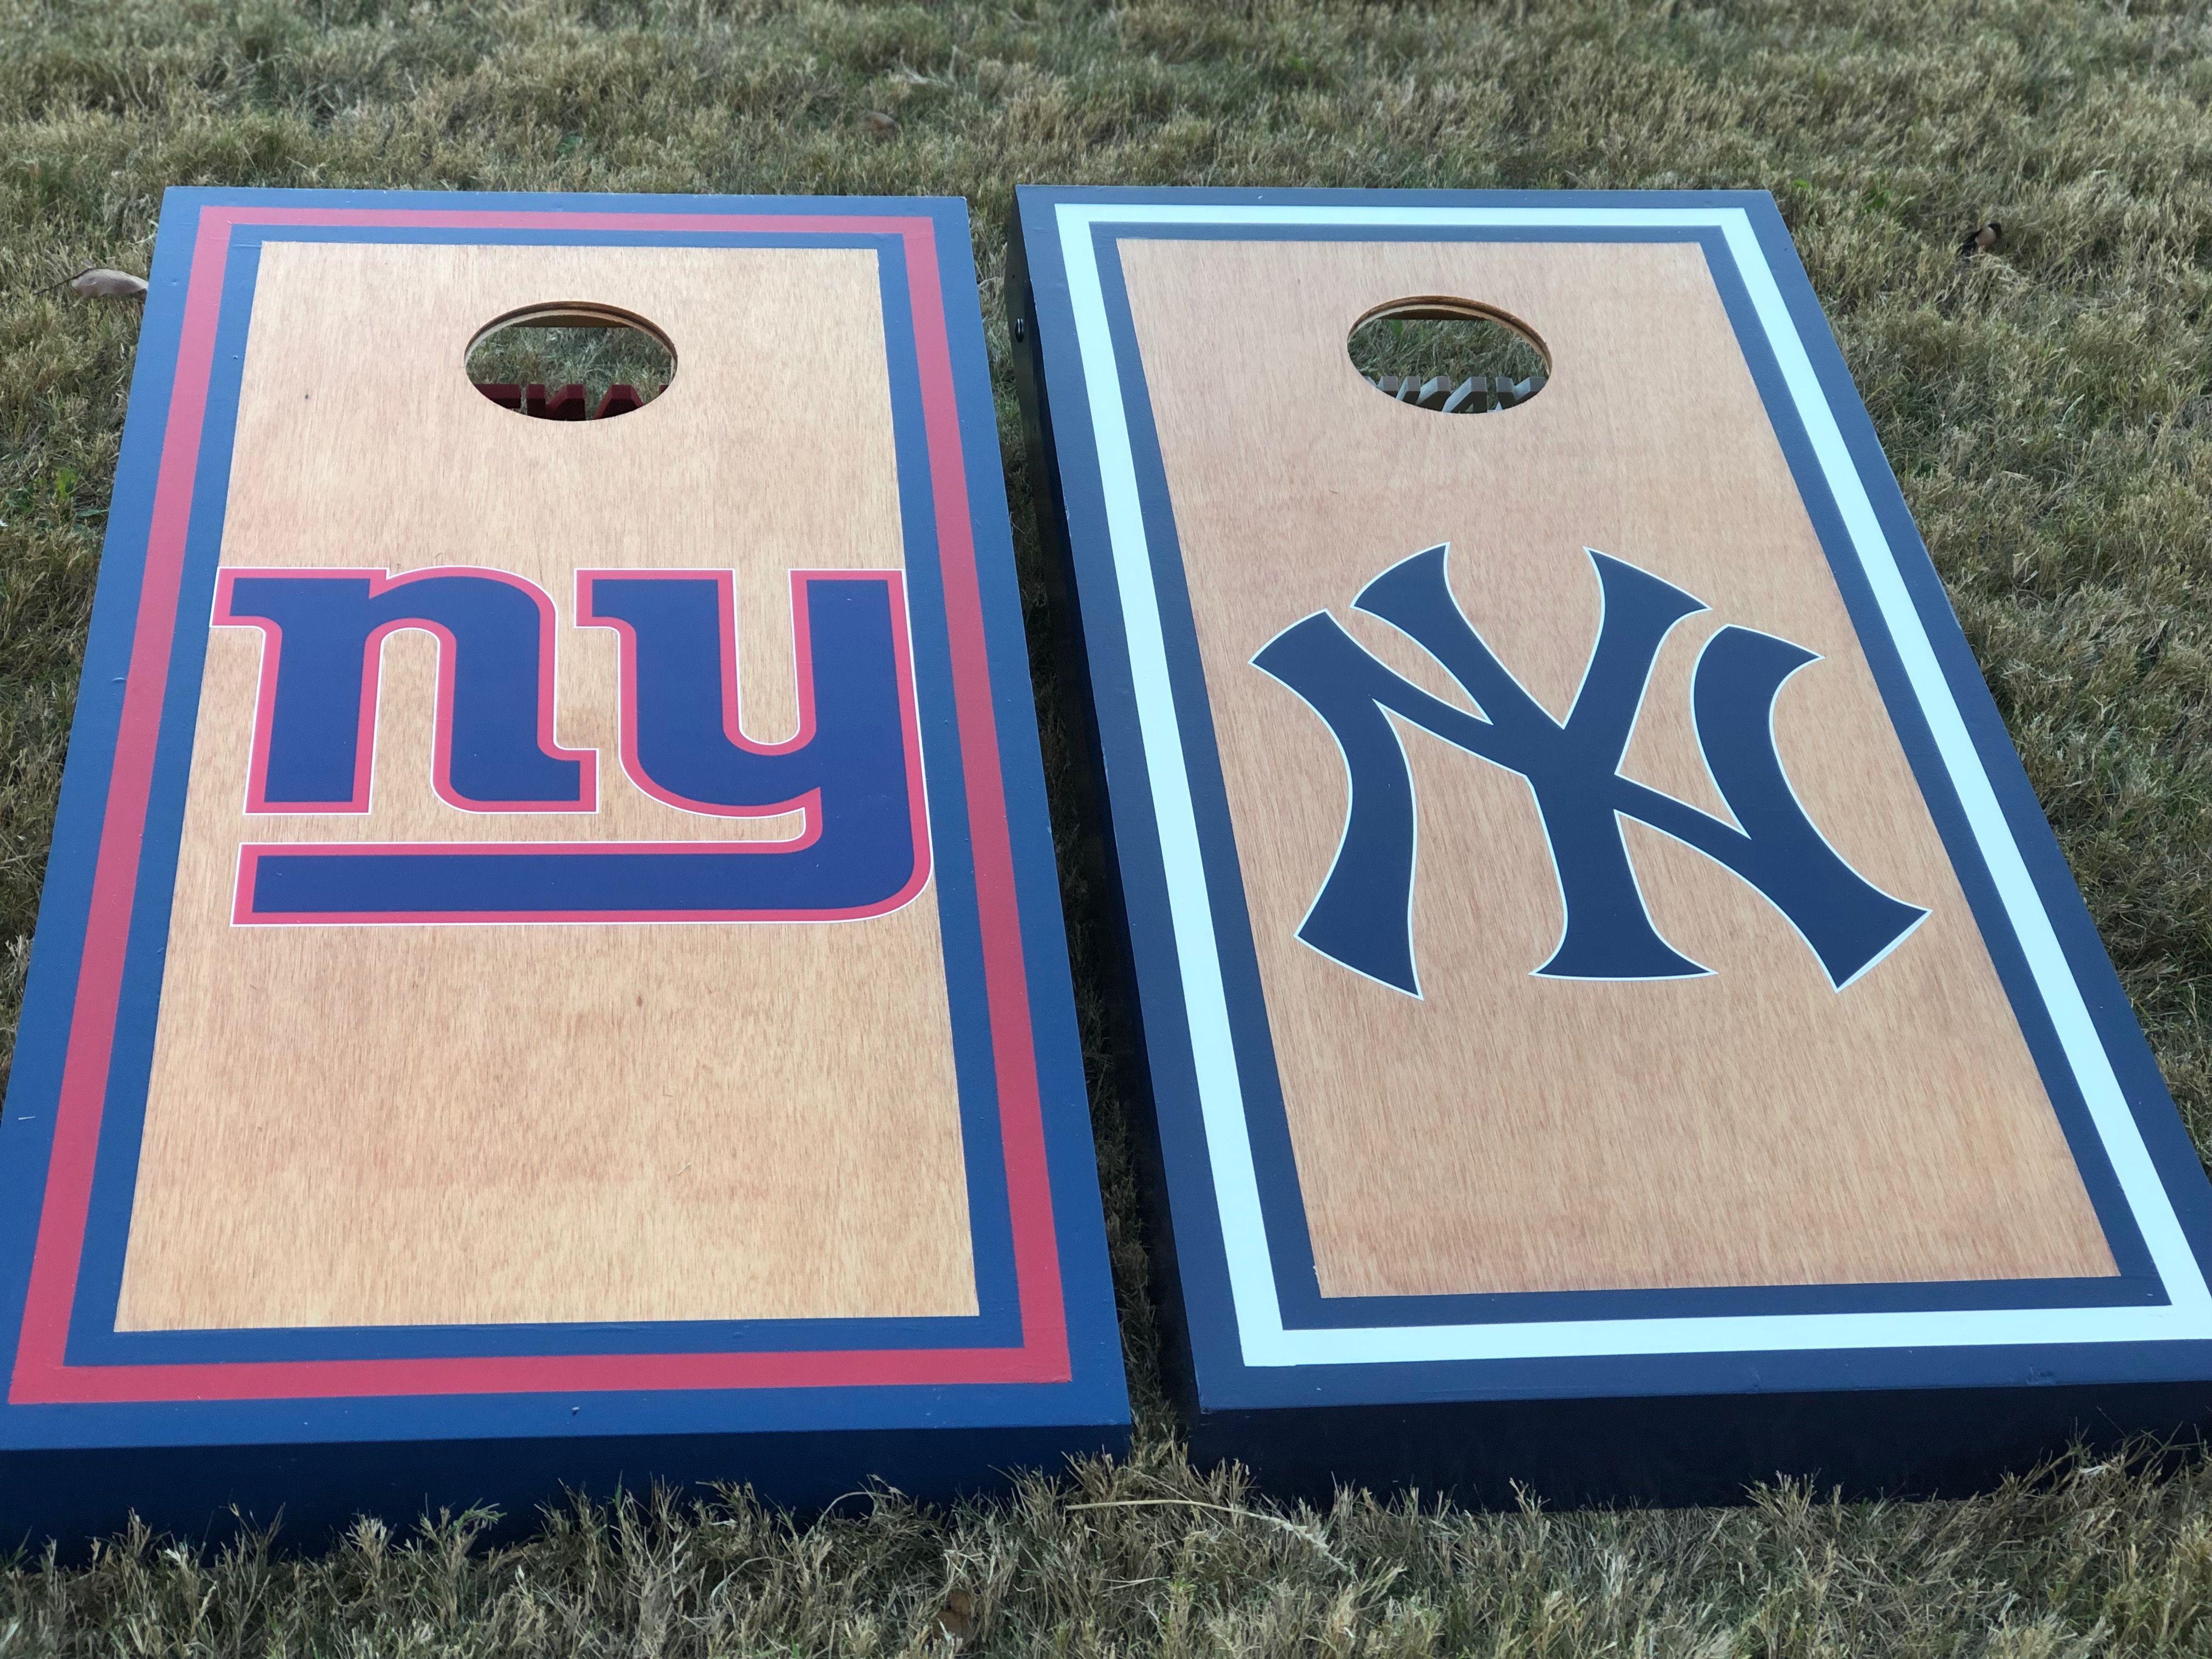 New York Giants New York Yankees Corn Hole Set Cornhole Set New York Giants Cornhole